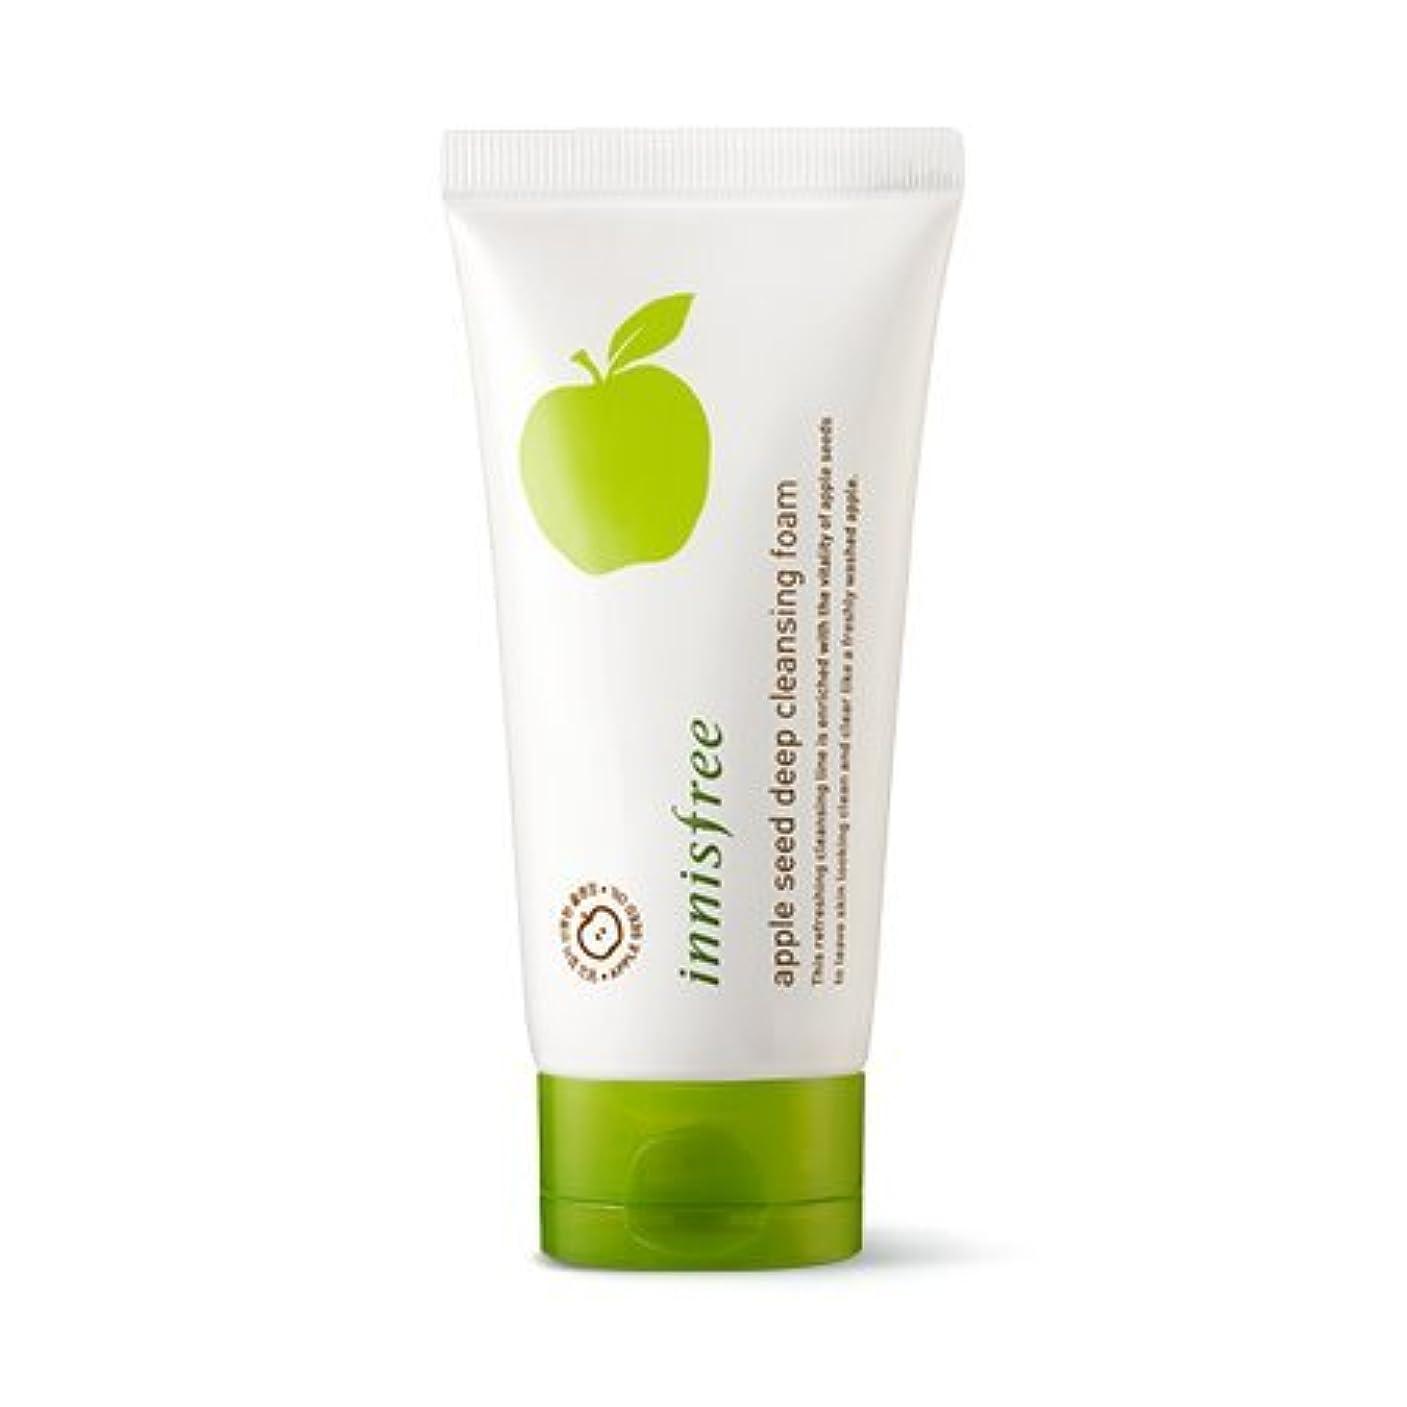 [New] innisfree Apple Seed Deep Cleansing Foam 150ml/イニスフリー アップル シード ディープ クレンジング フォーム 150ml